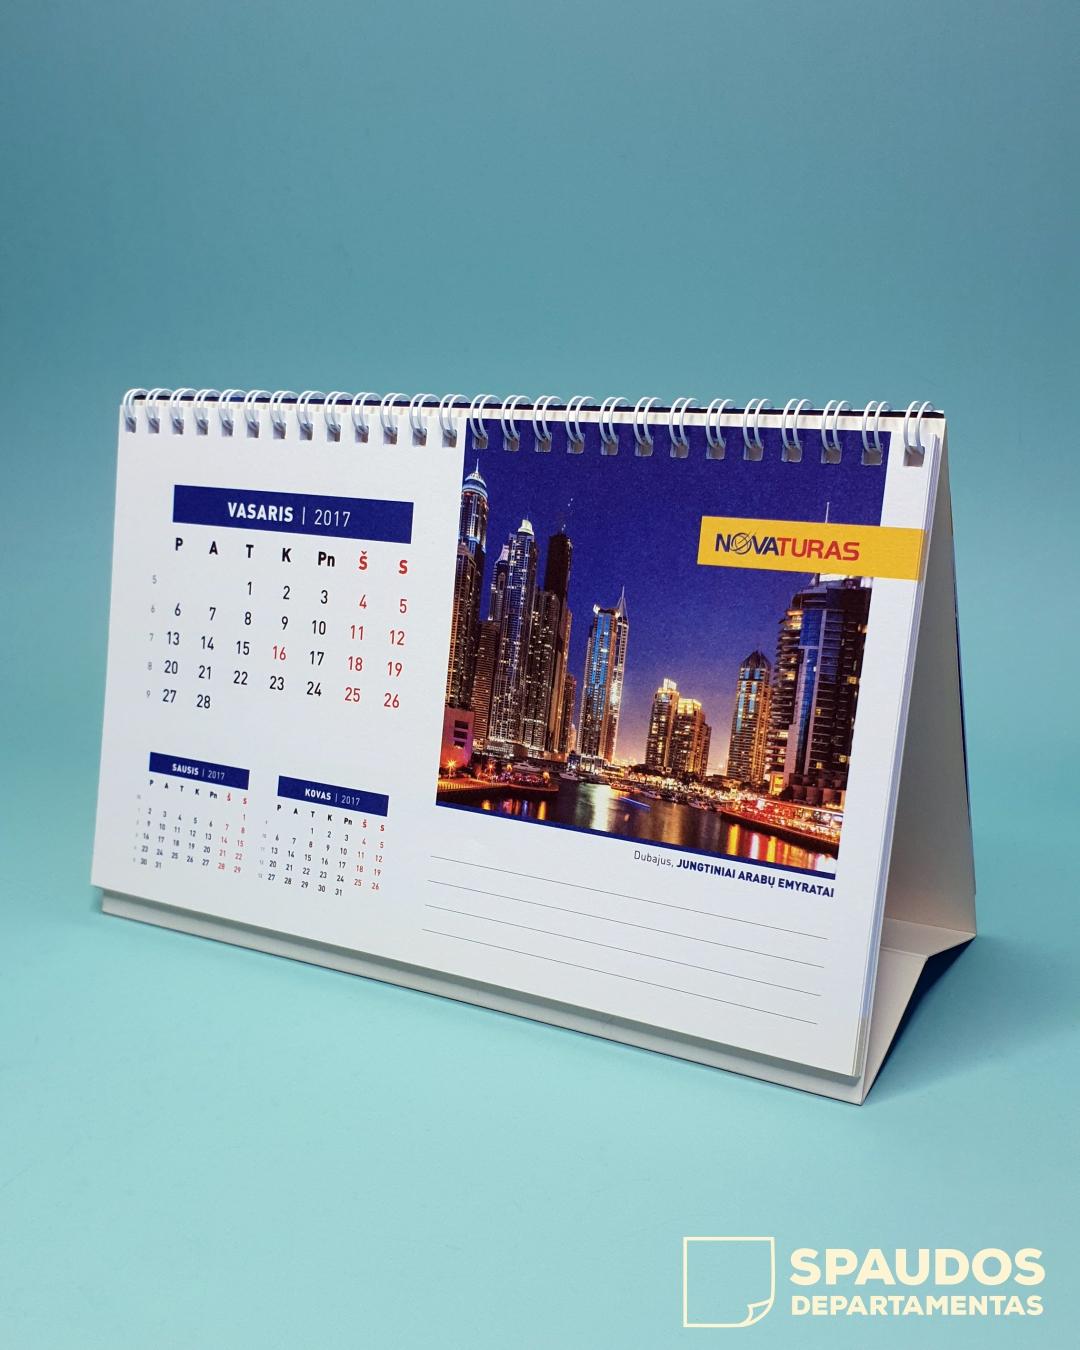 Kalendorius 2021 | Spaudos Departamentas